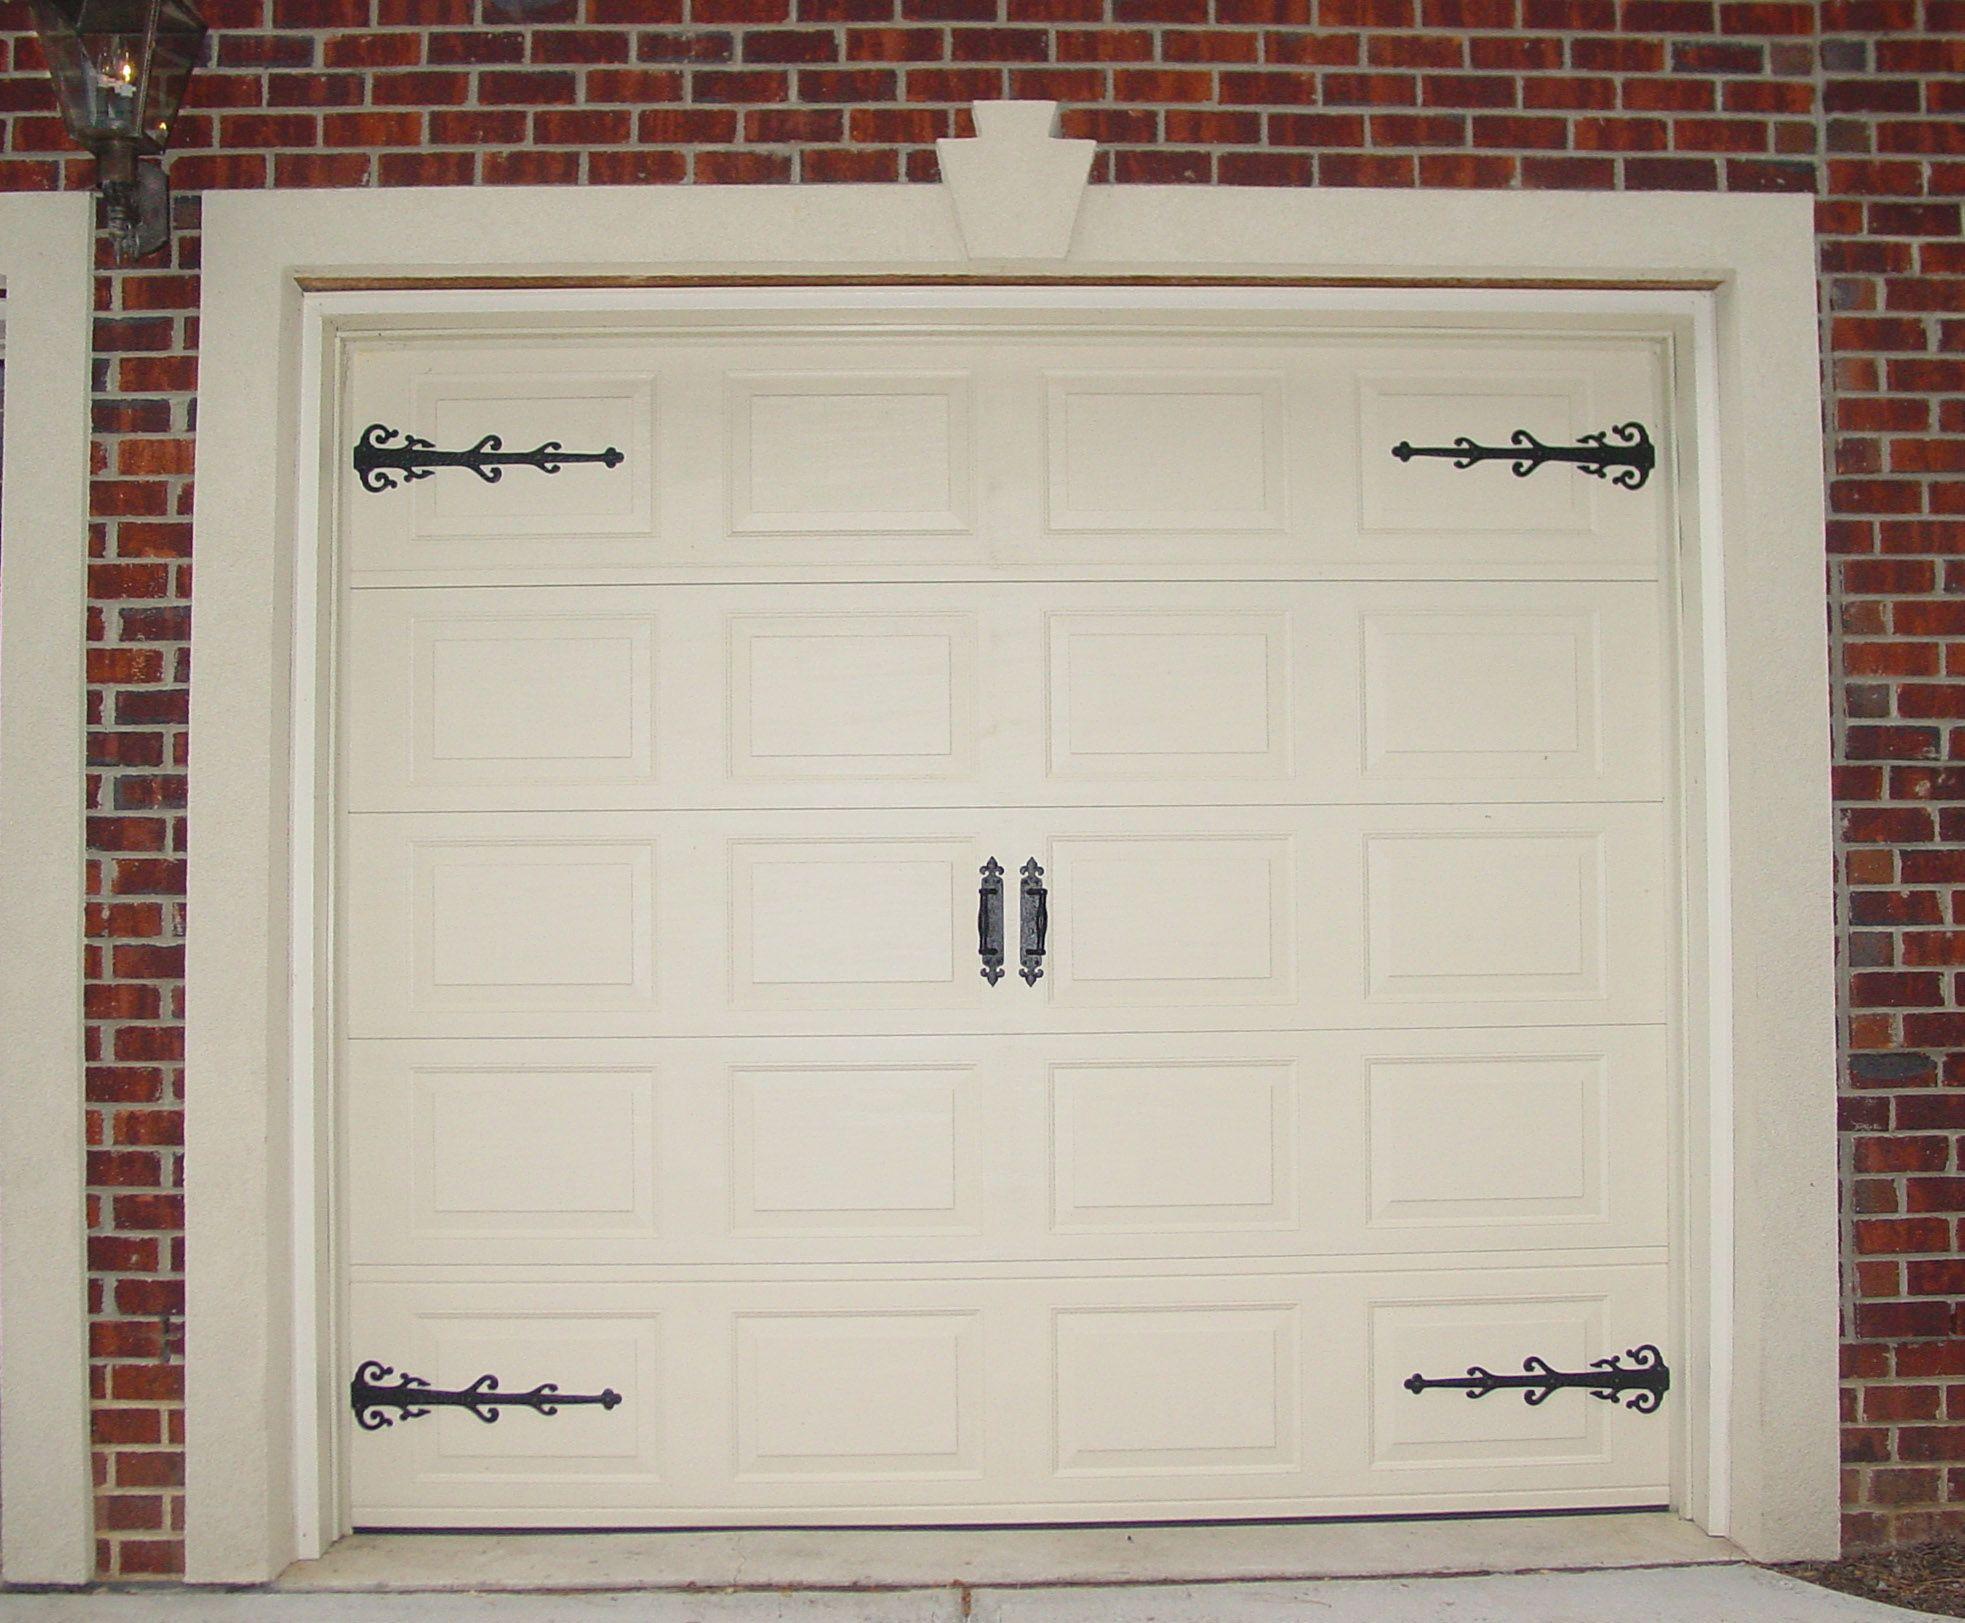 17  images about Decorative Garage Door Hardware on Pinterest   Cape code  Powder and Garage door decorative hardware. 17  images about Decorative Garage Door Hardware on Pinterest